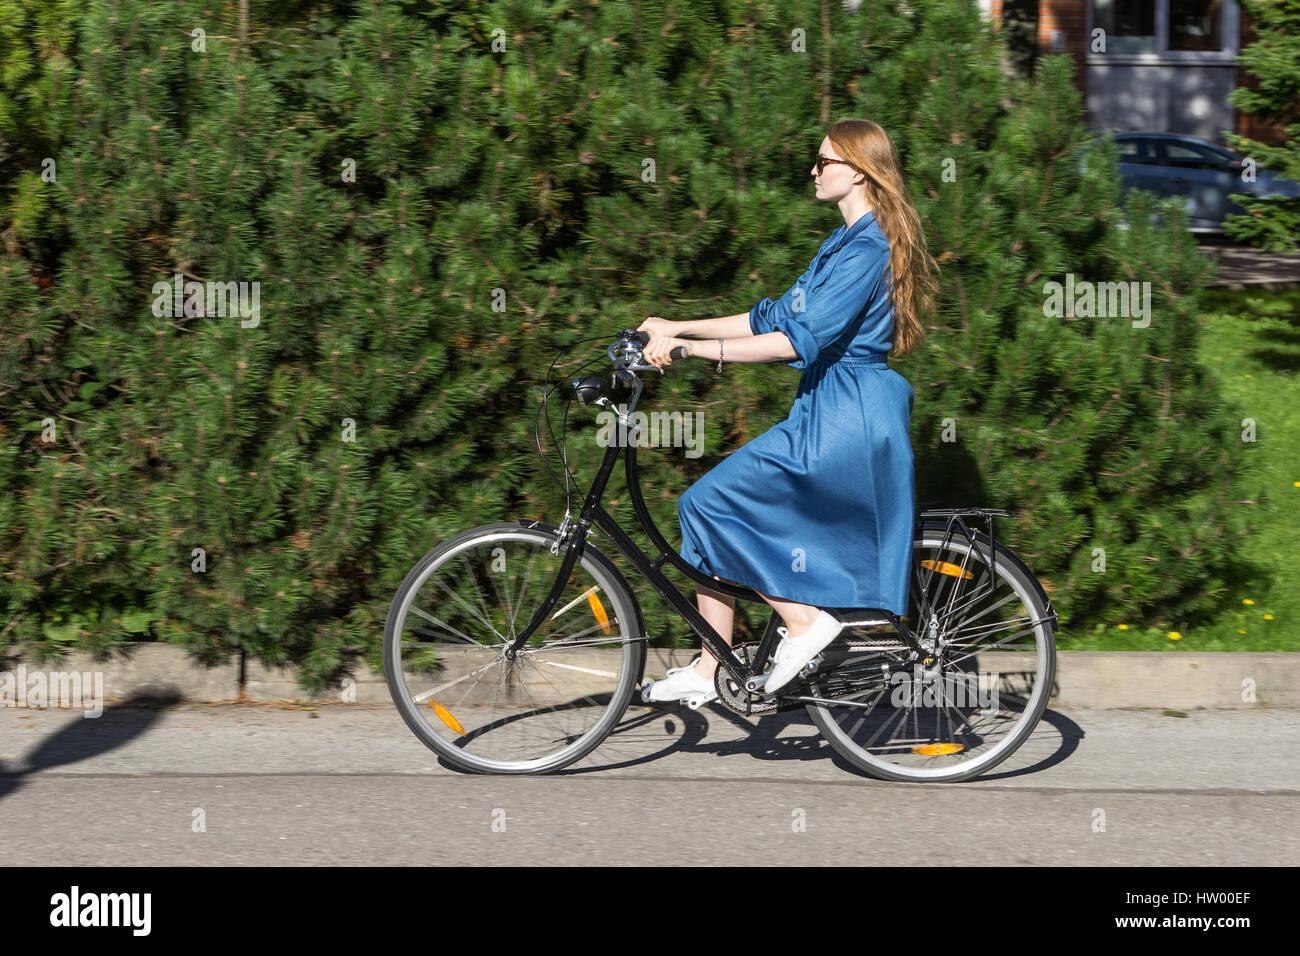 Women Vintage Bike Stockfotos & Women Vintage Bike Bilder - Alamy